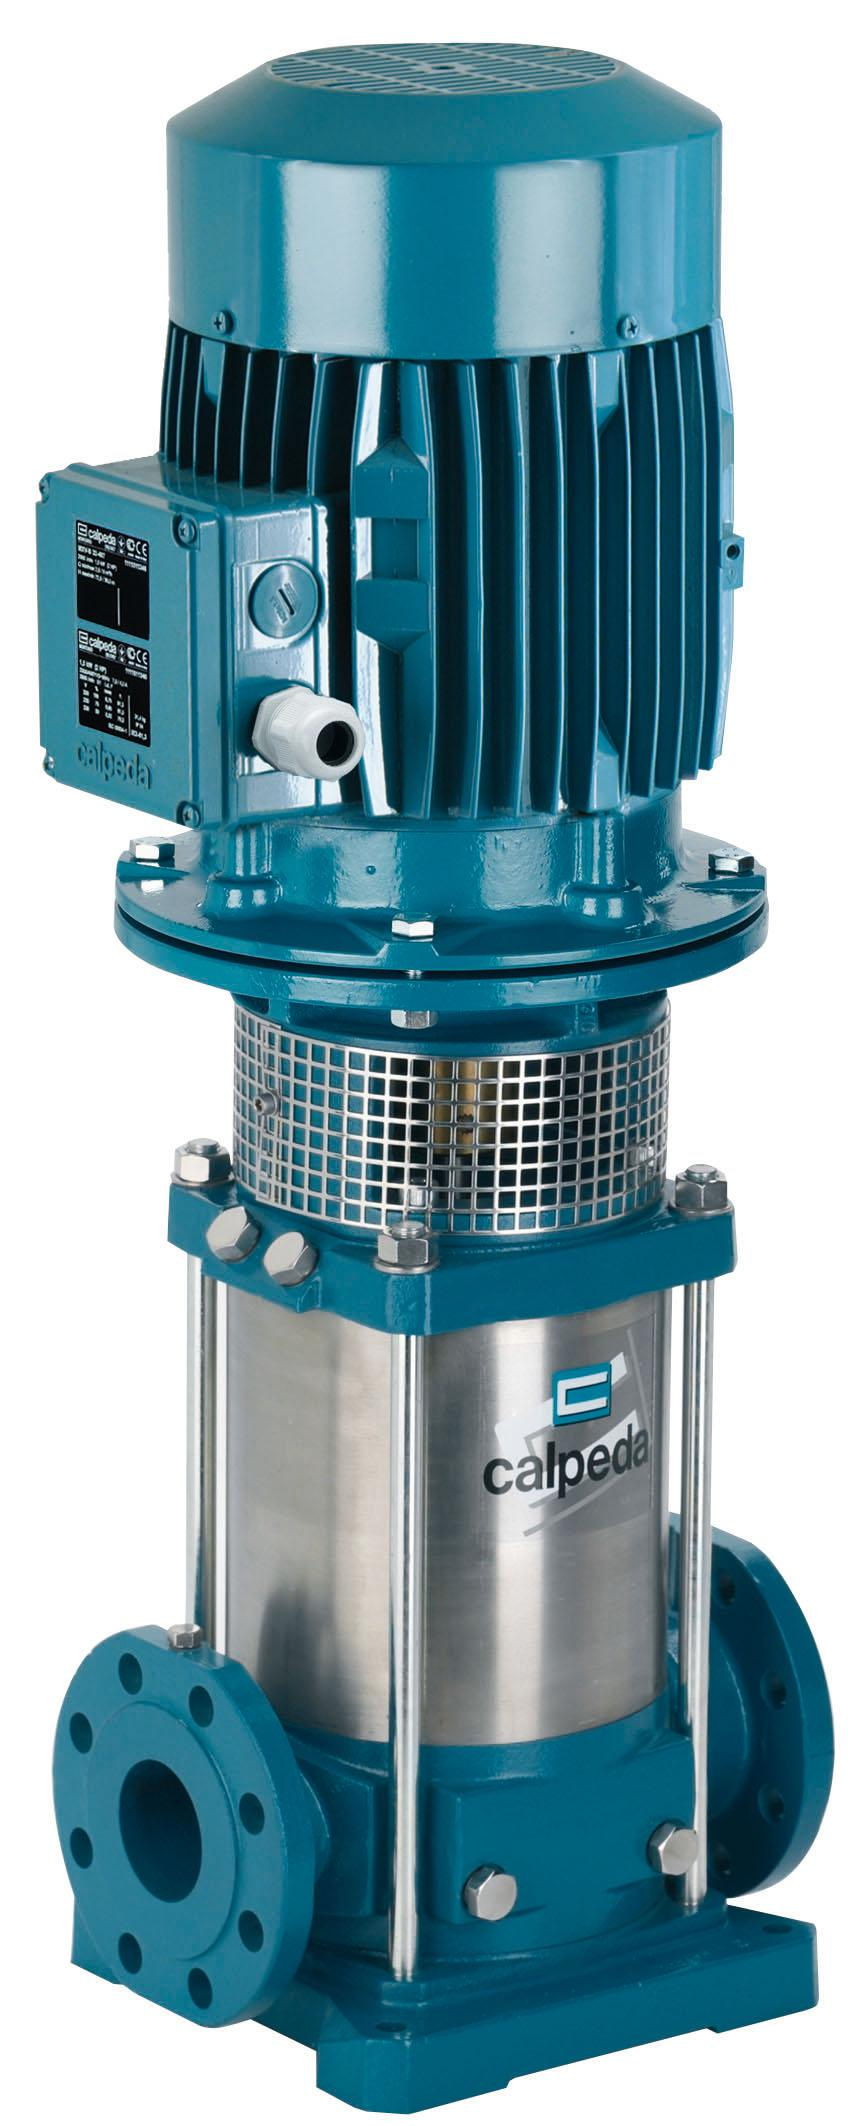 Насос Calpeda Mxv 50-1608/c 400/690/50 hz m132 v1-7.5t